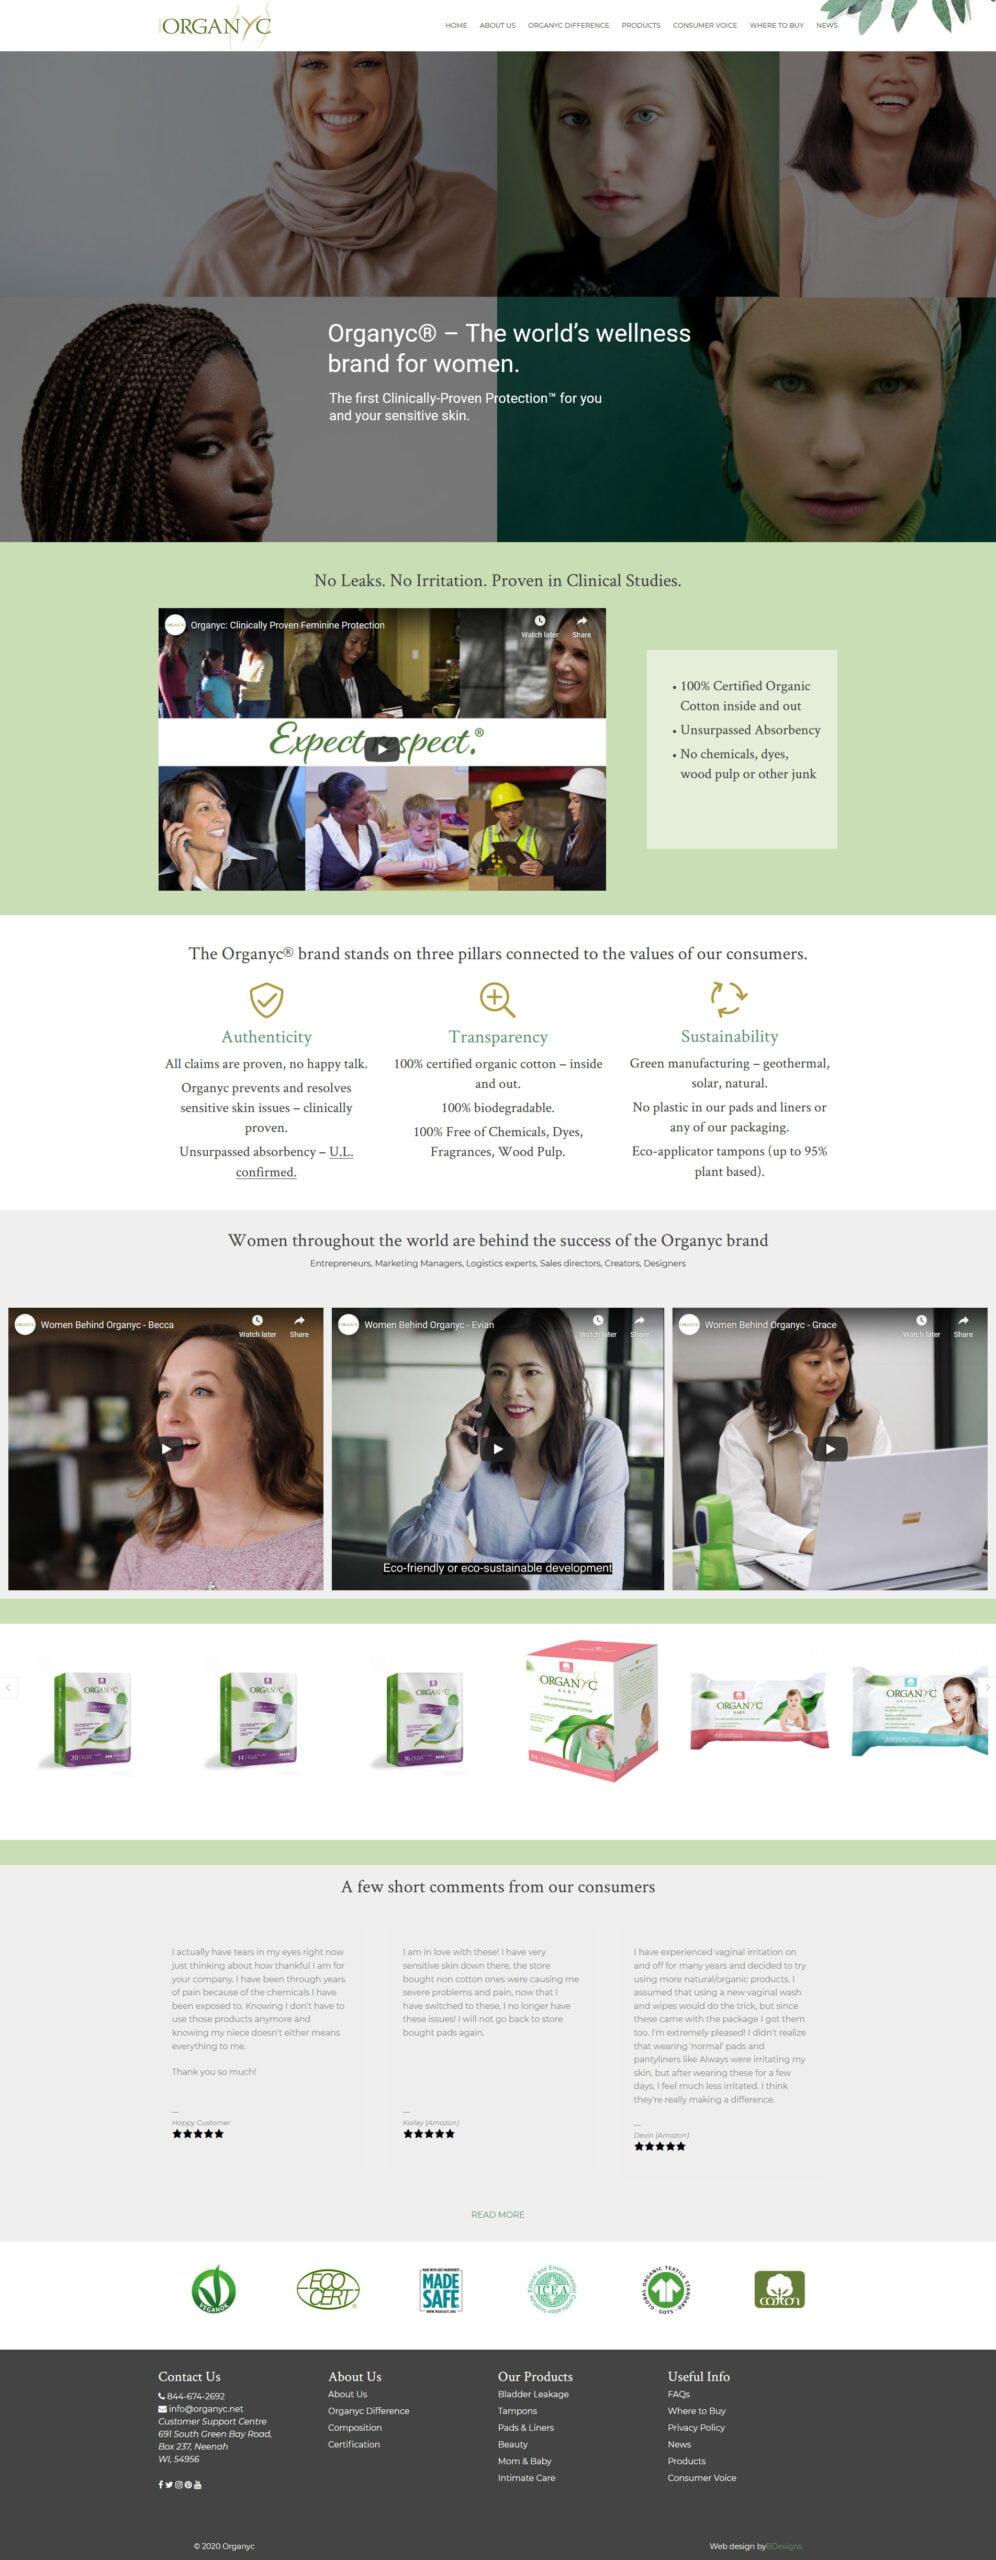 Screenshot_2020-07-01 Organyc - The world's wellness brand for women